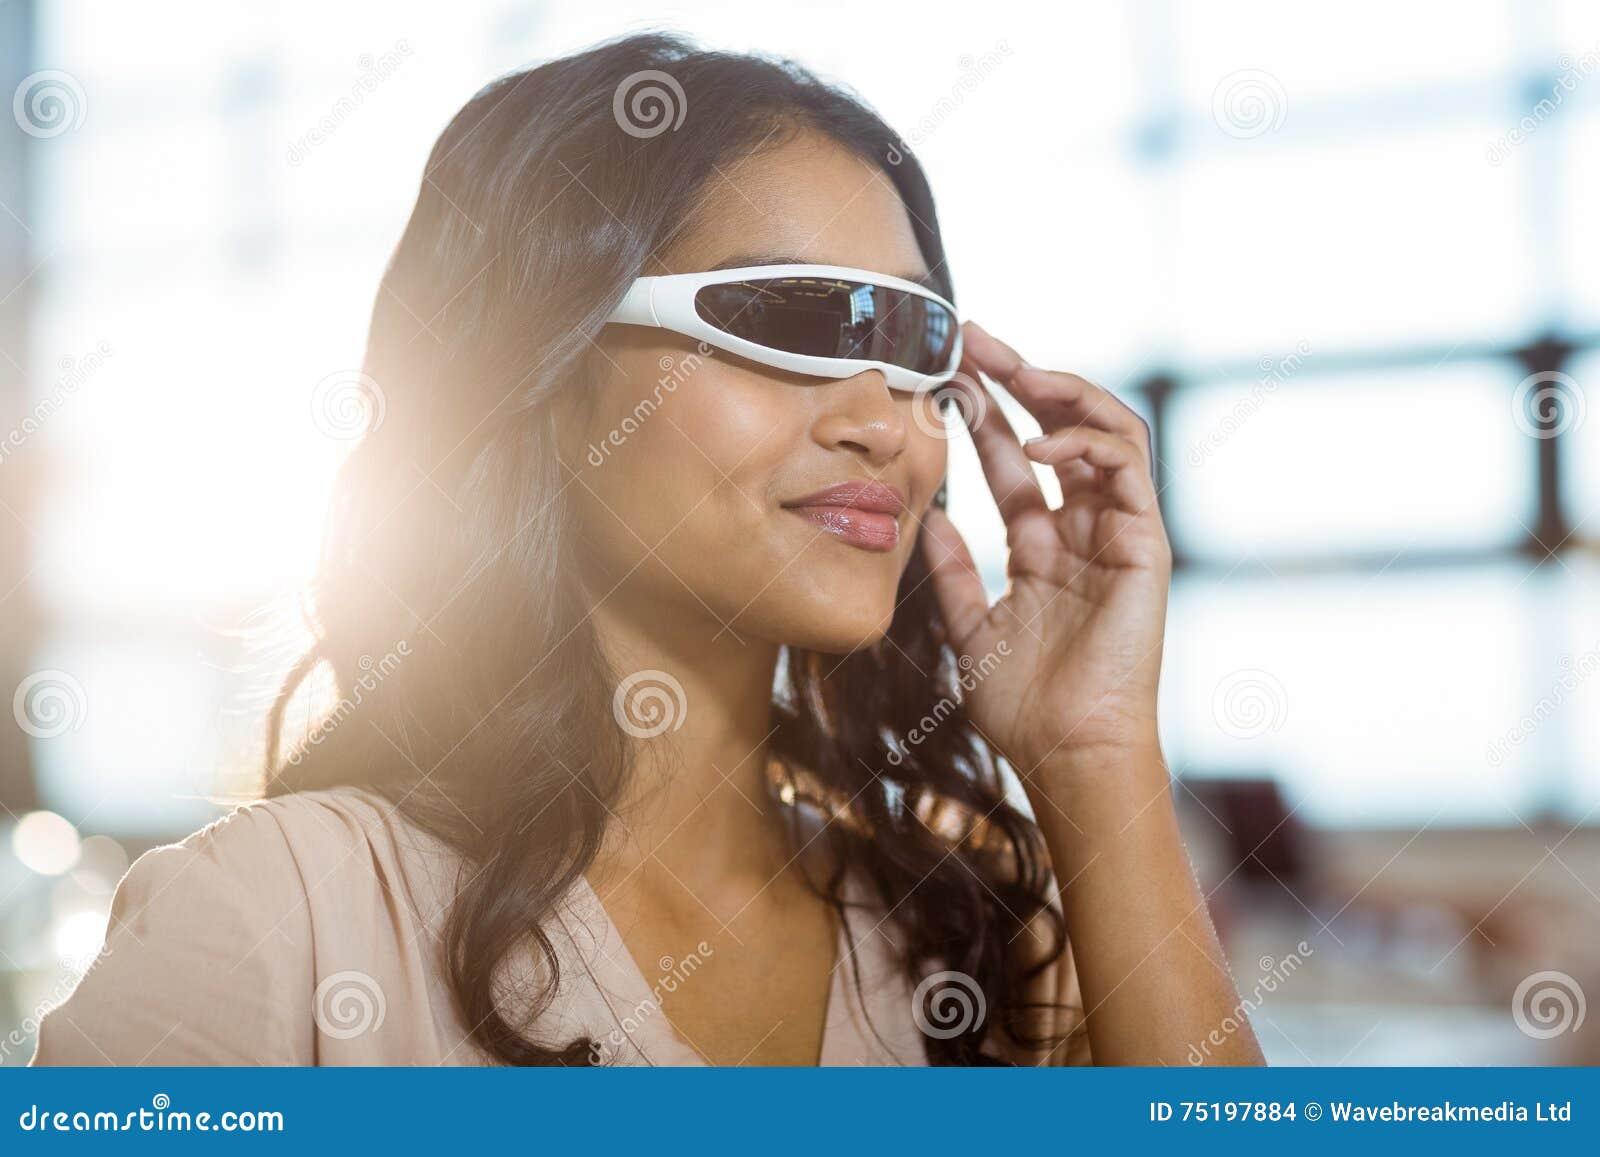 Adult virtual 3d